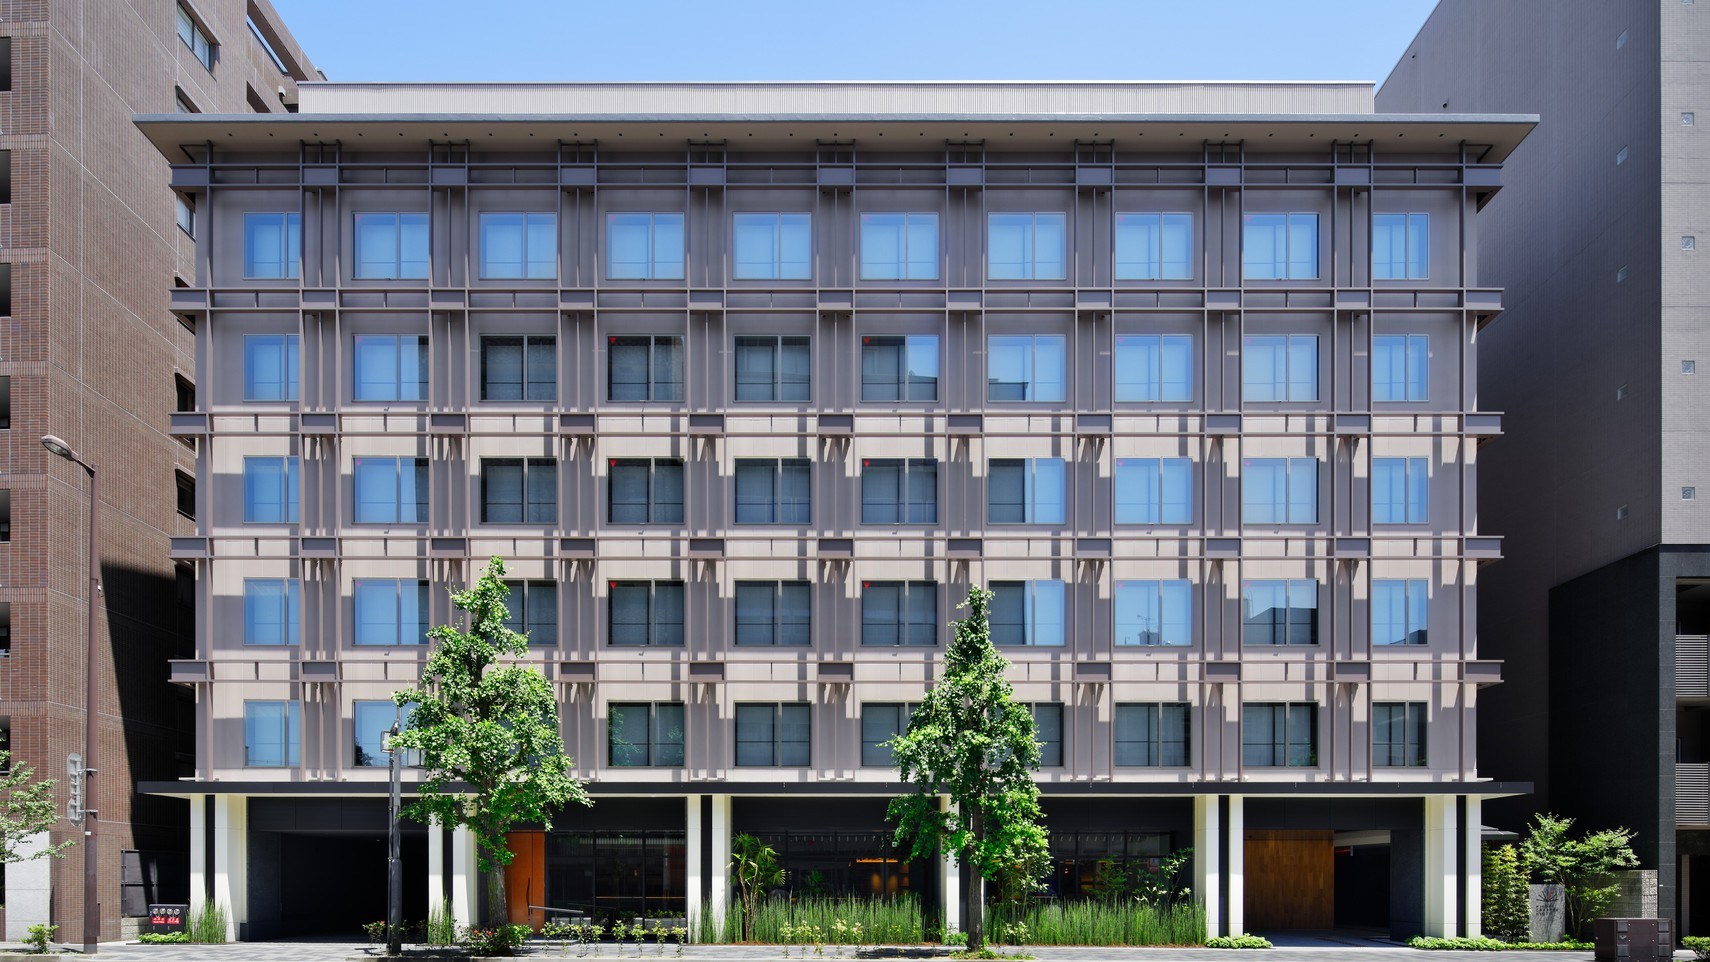 HIYORIチャプター京都 トリビュートポートフォリオホテル image